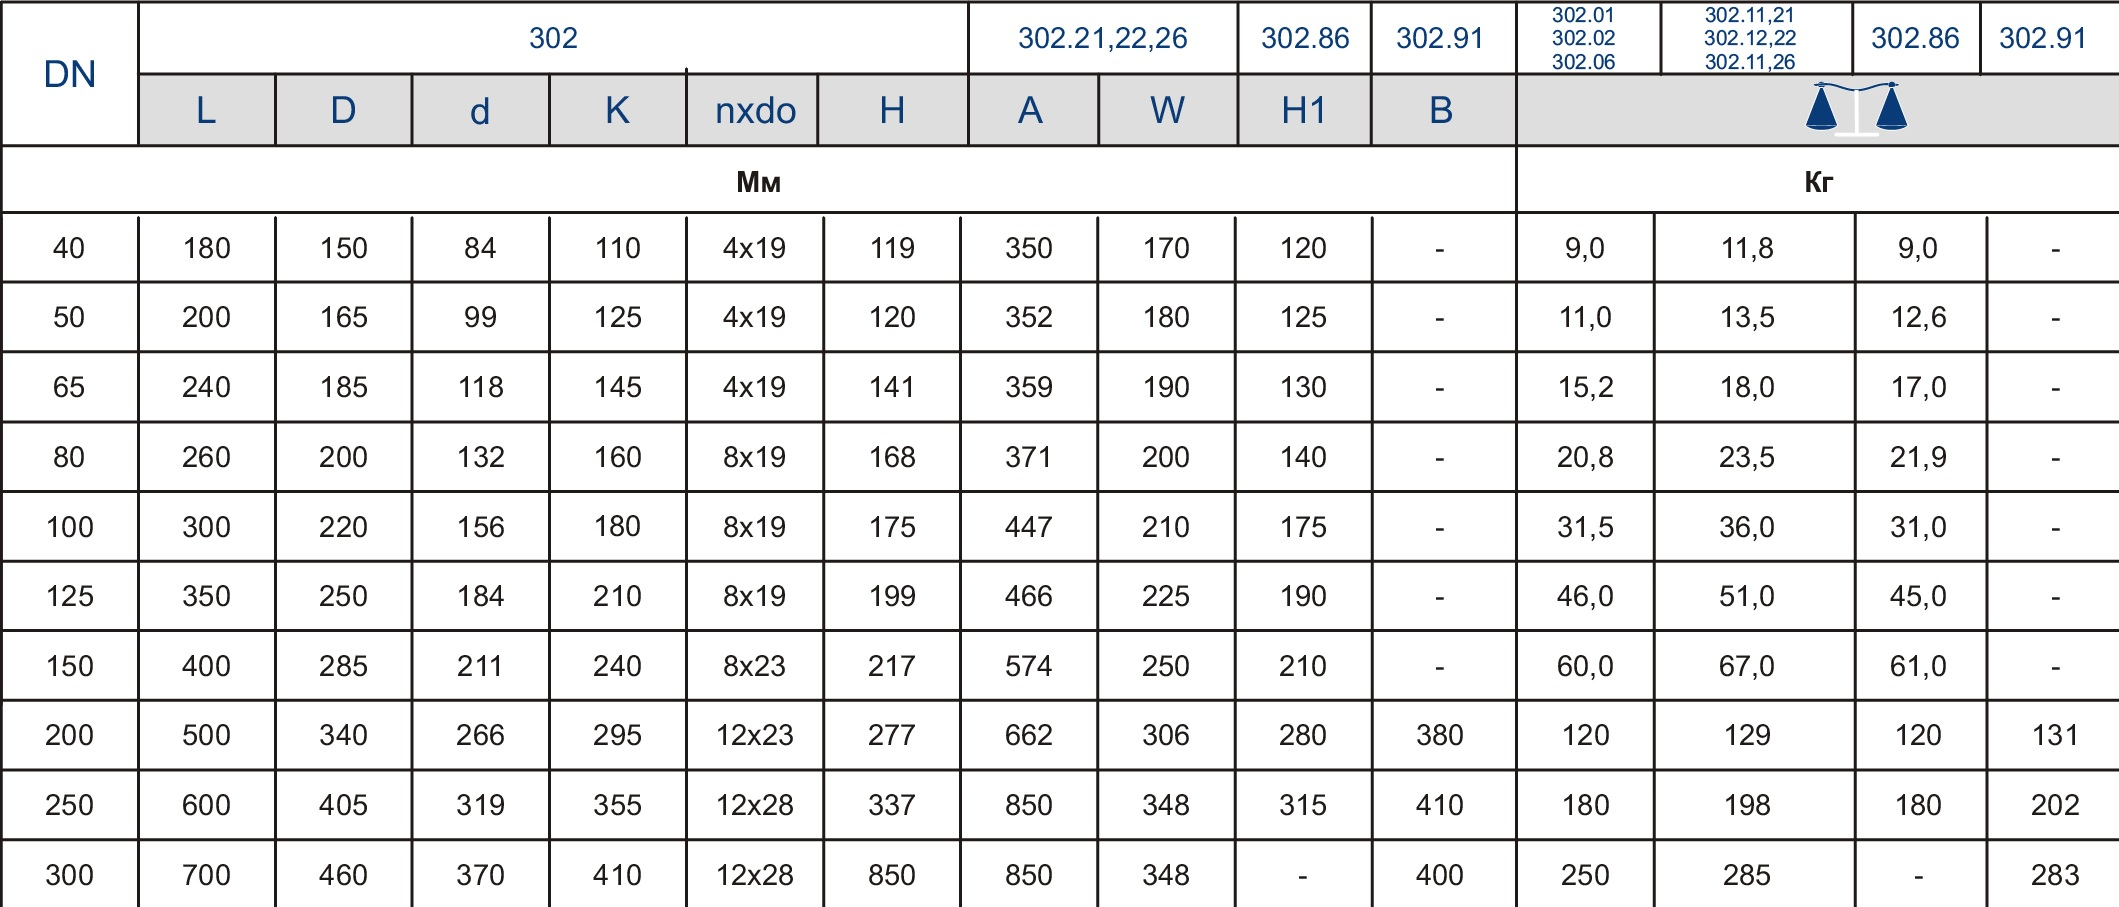 Таблица характеристик для Обратный клапан чугунный фланцевый Zetkama арт. 302 (поворотный) DN150